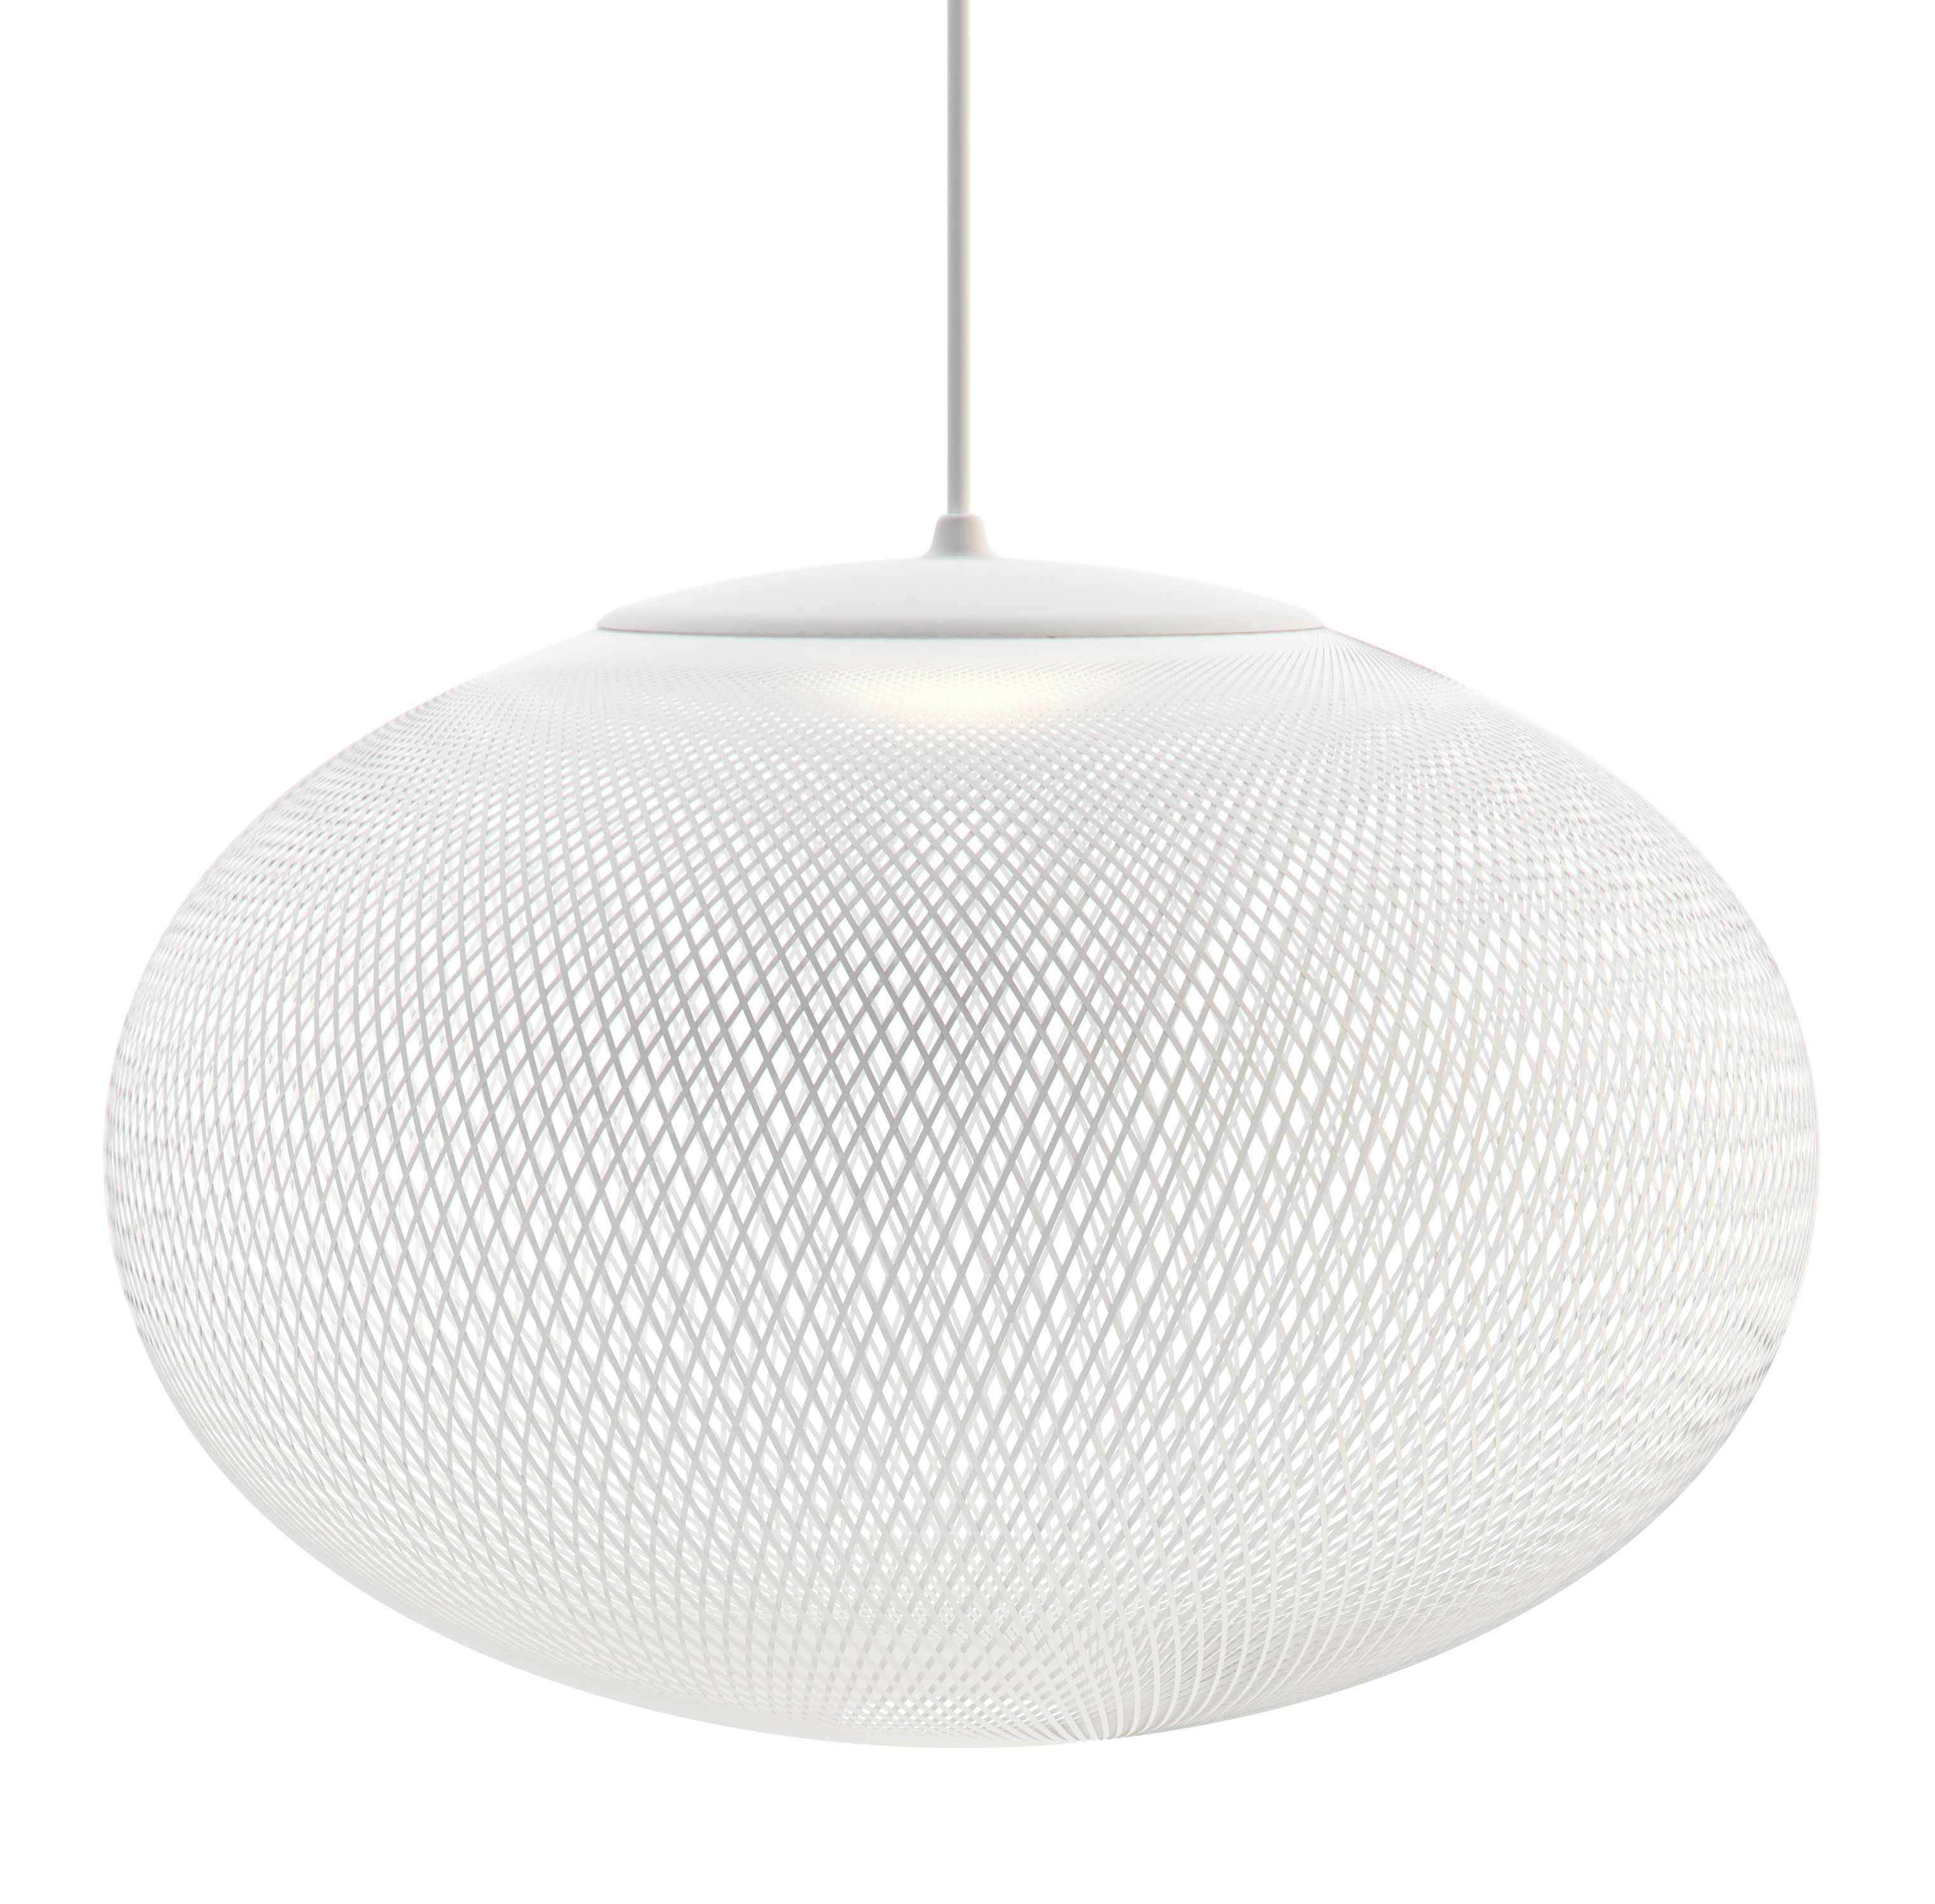 Lighting - Pendant Lighting - NR2 Medium LED Pendant - Fiberglass / Ø 55 cm by Moooi - White - Fibreglass, Plastic